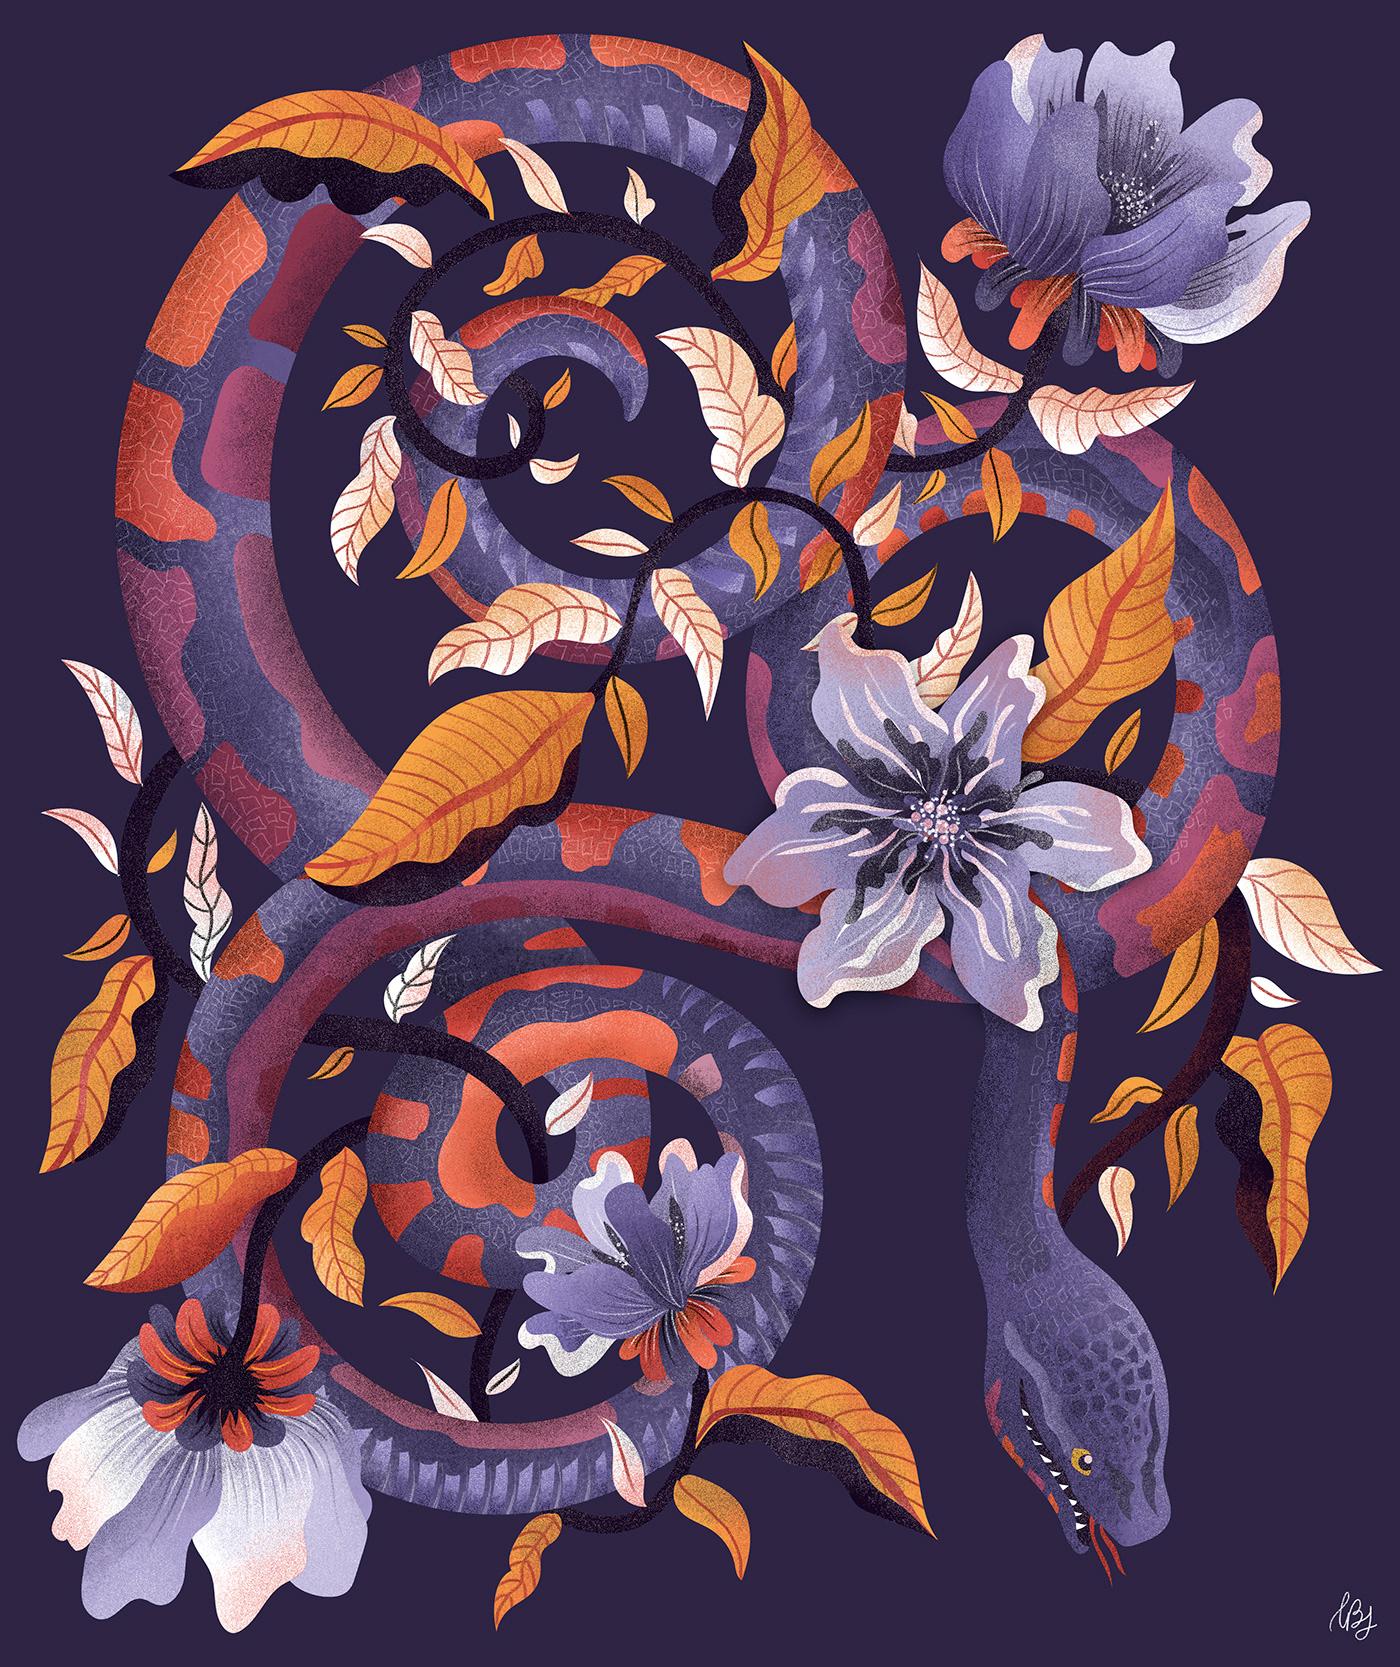 botanical botanical illustration floral floral illustration graphic design  iguana ILLUSTRATION  Nature reptile reptiles